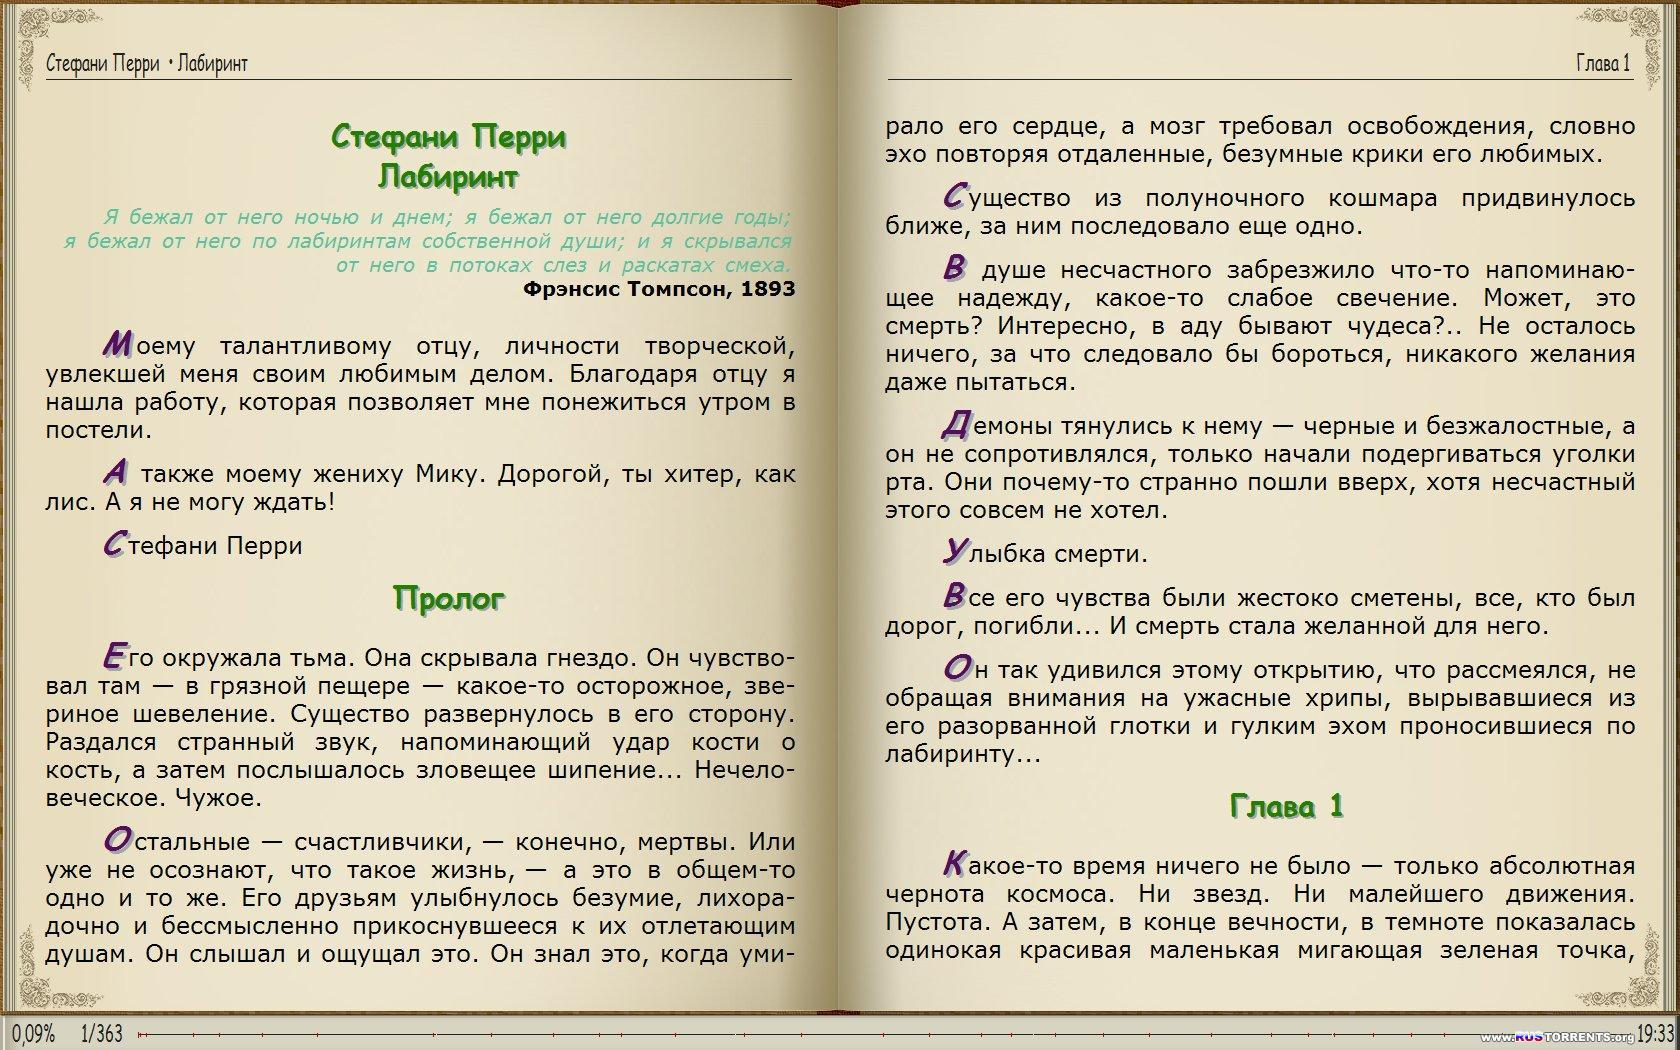 Стефани Перри - Сборник произведений (1993-2014)